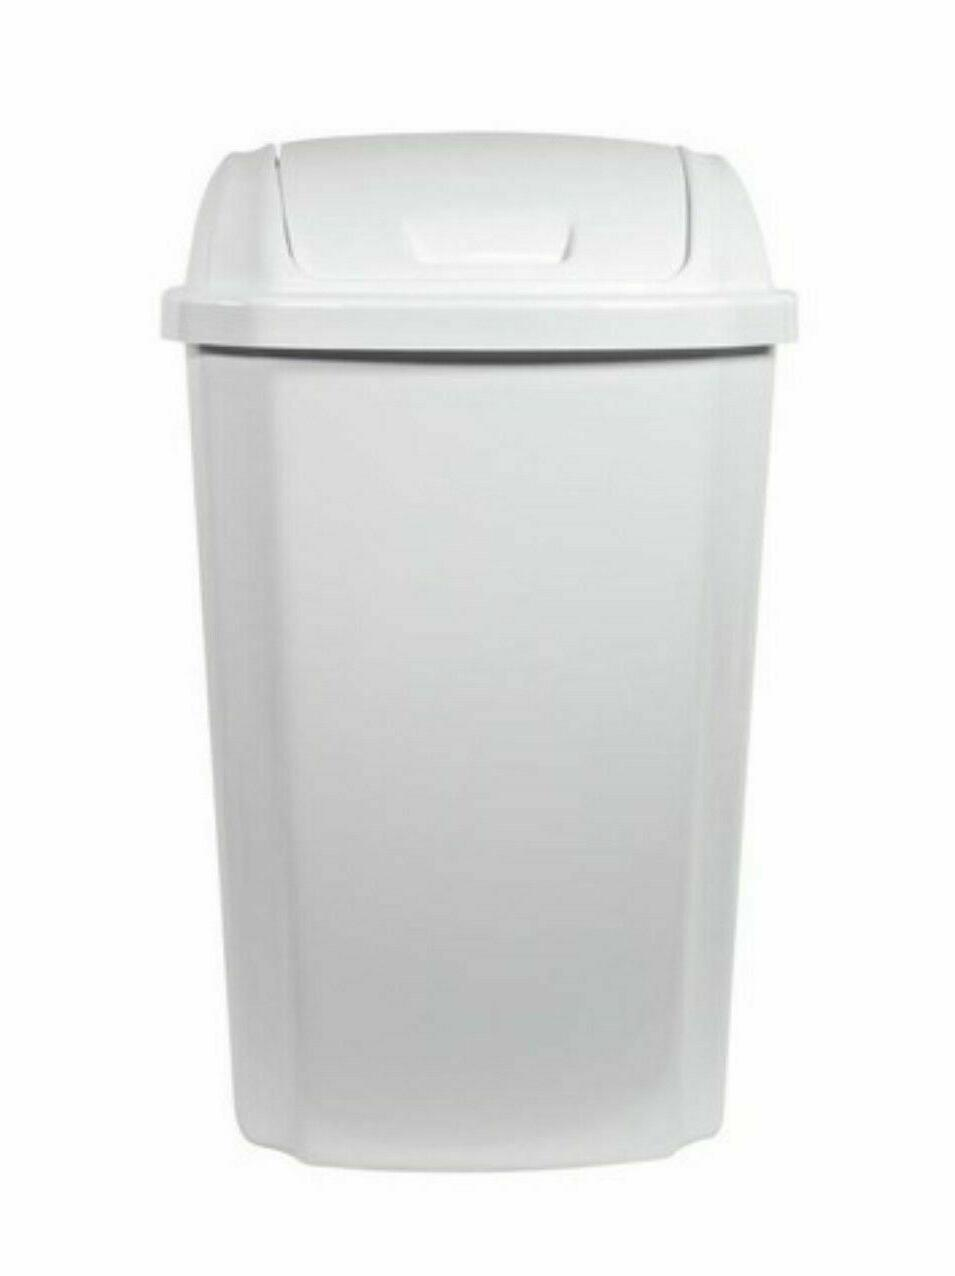 Hefty Swing-Lid 13.5-Gallon Wastebasket Trash Can White